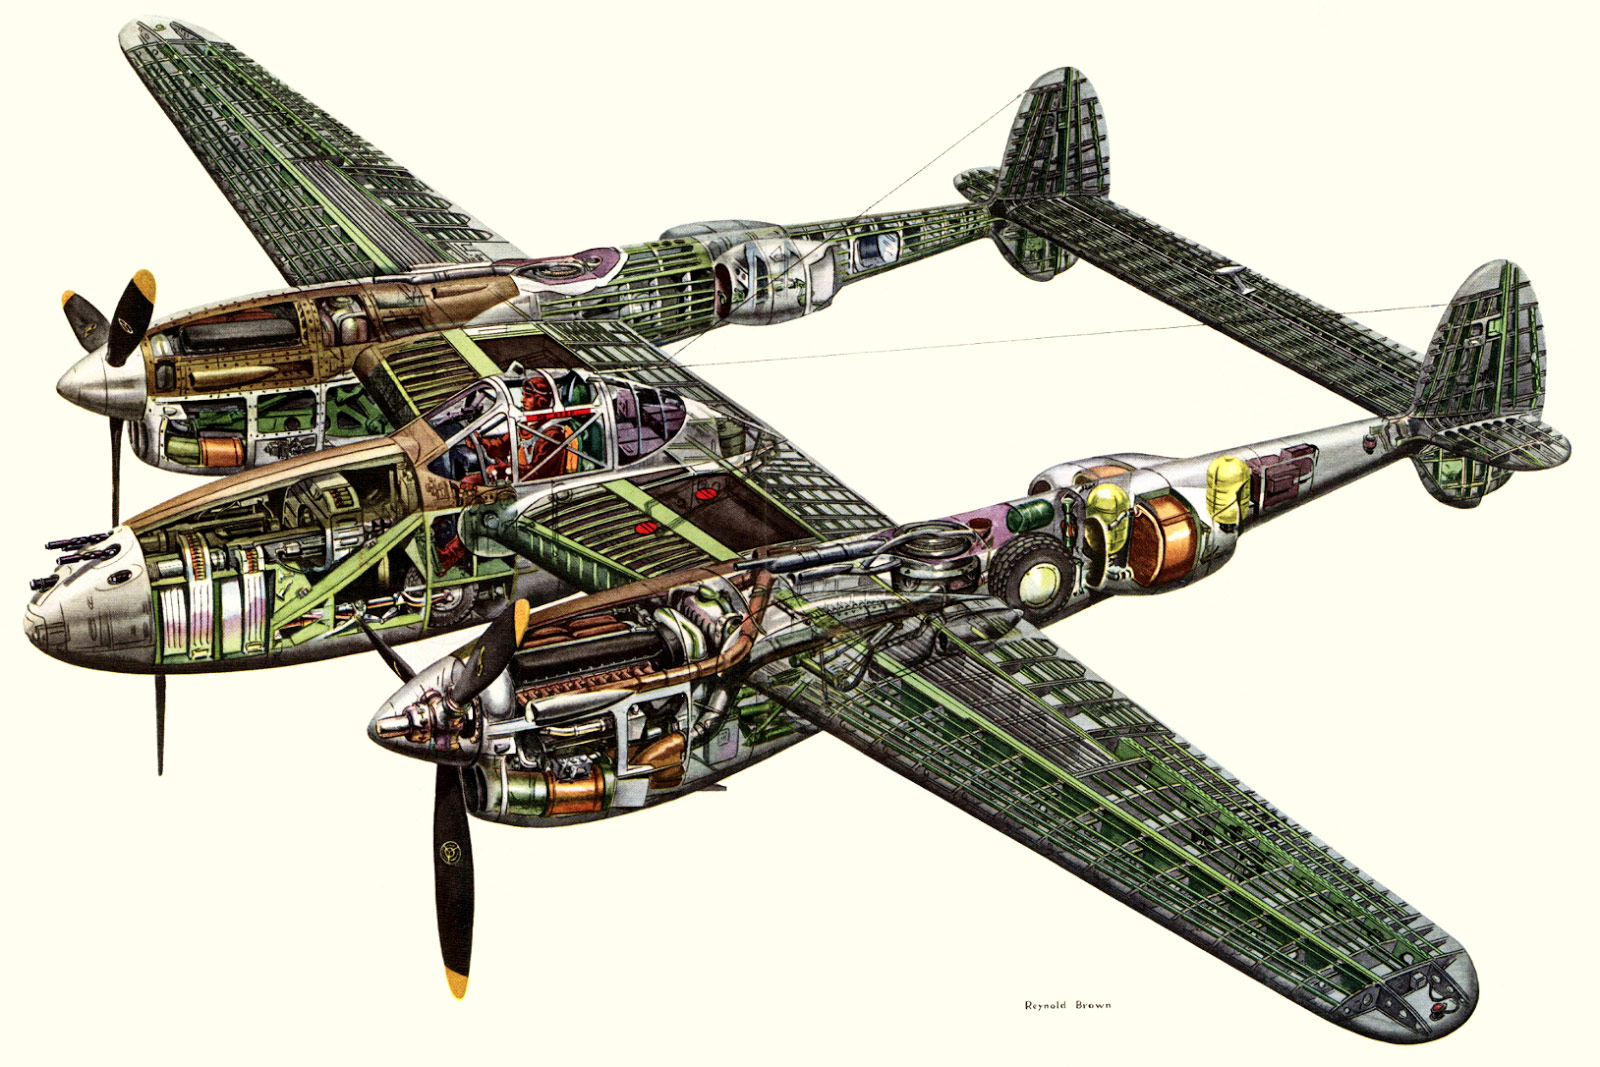 Lockheed P-38 Lightning cutaway